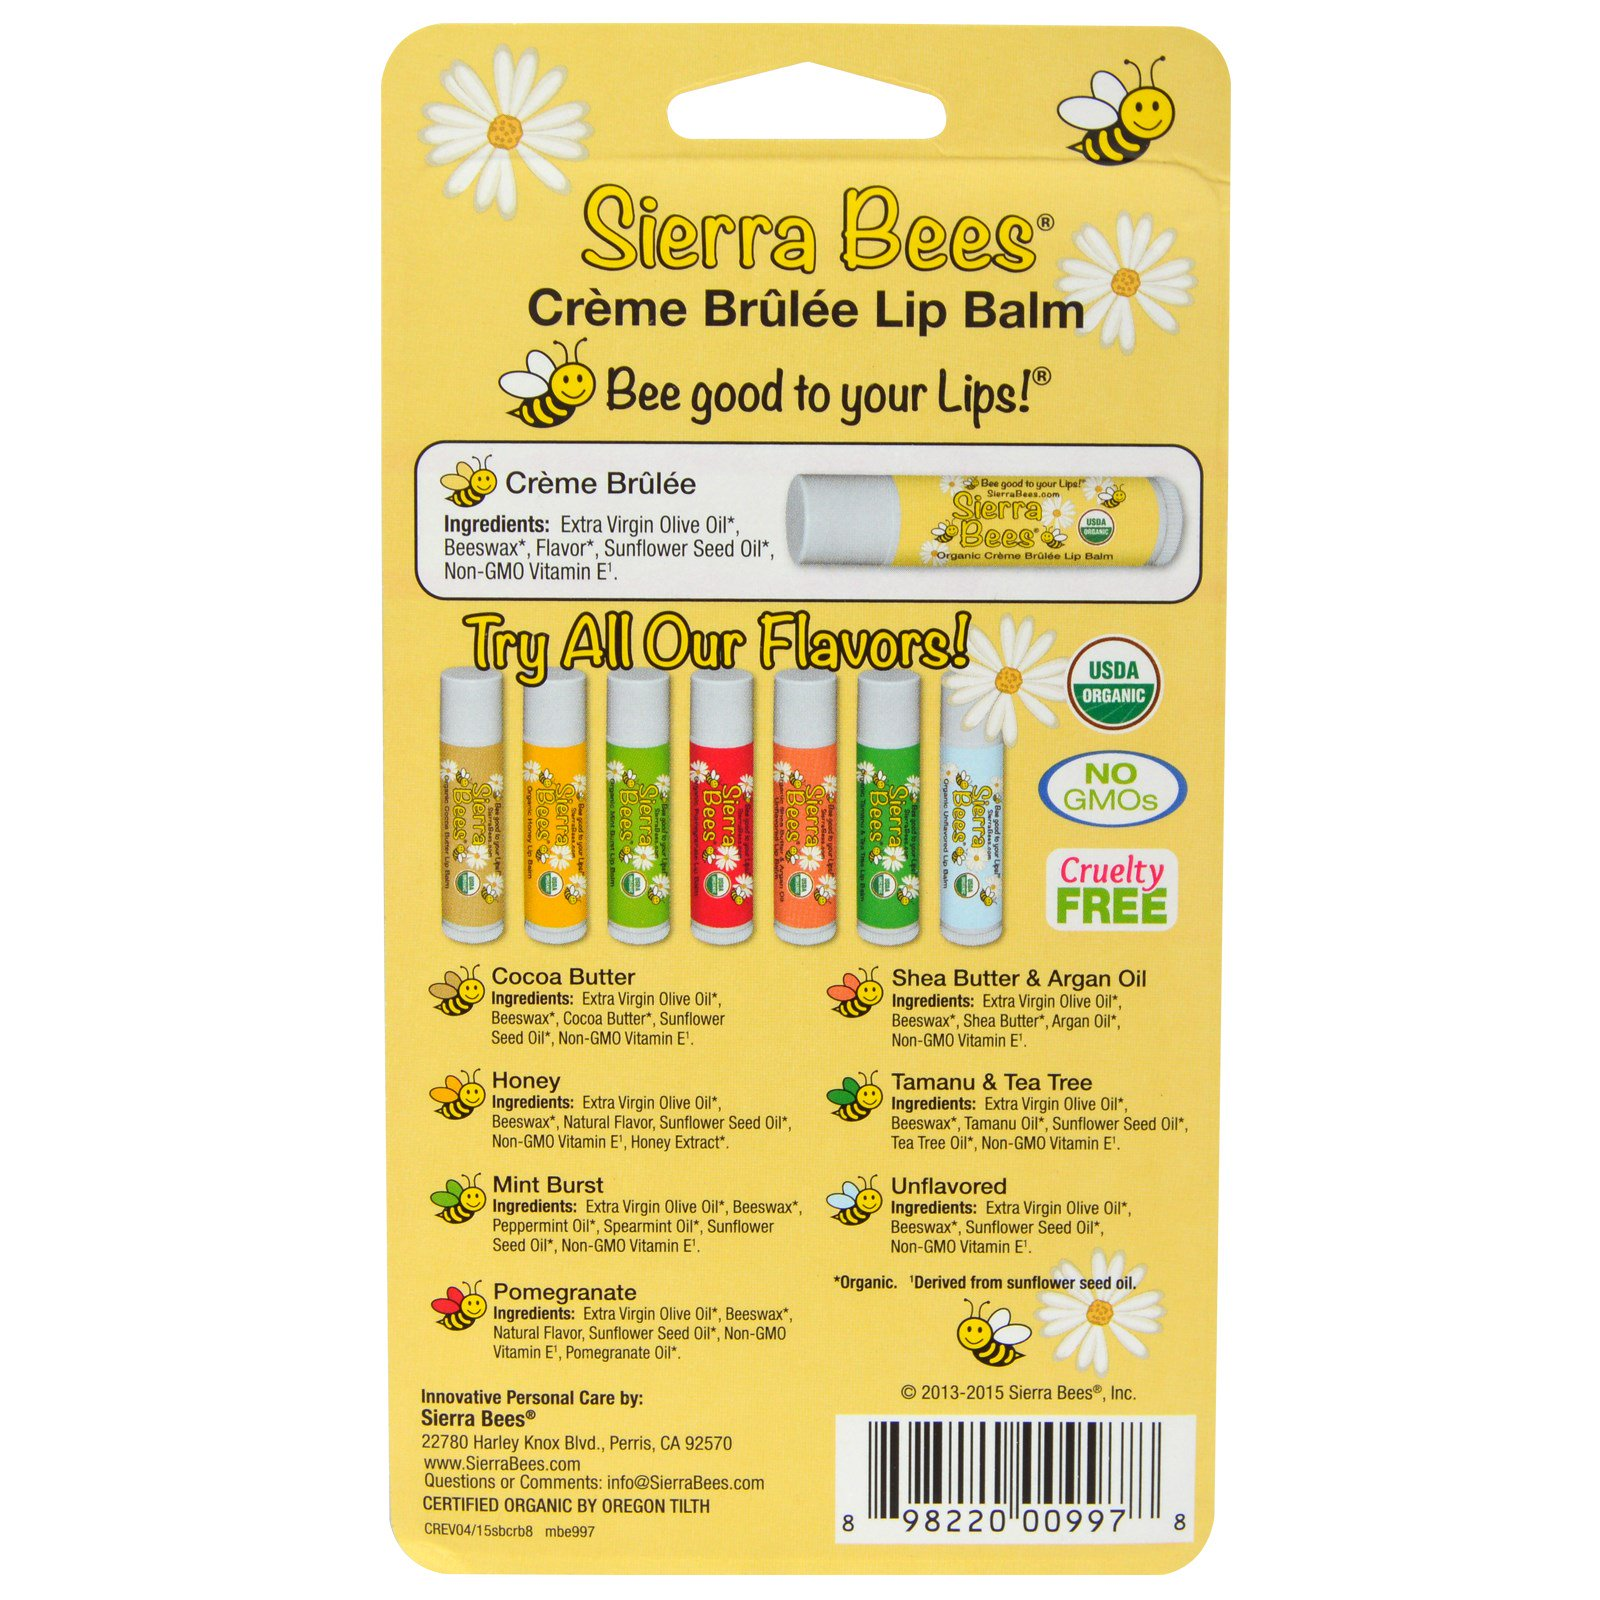 Sierra Bees, Organic Lip Balms, Variety Pack, 8 Pack, 0.15 Oz Each TOMATO PIE 120G Soften Whitening Brightening Moisturizing Treatment Hand Mask